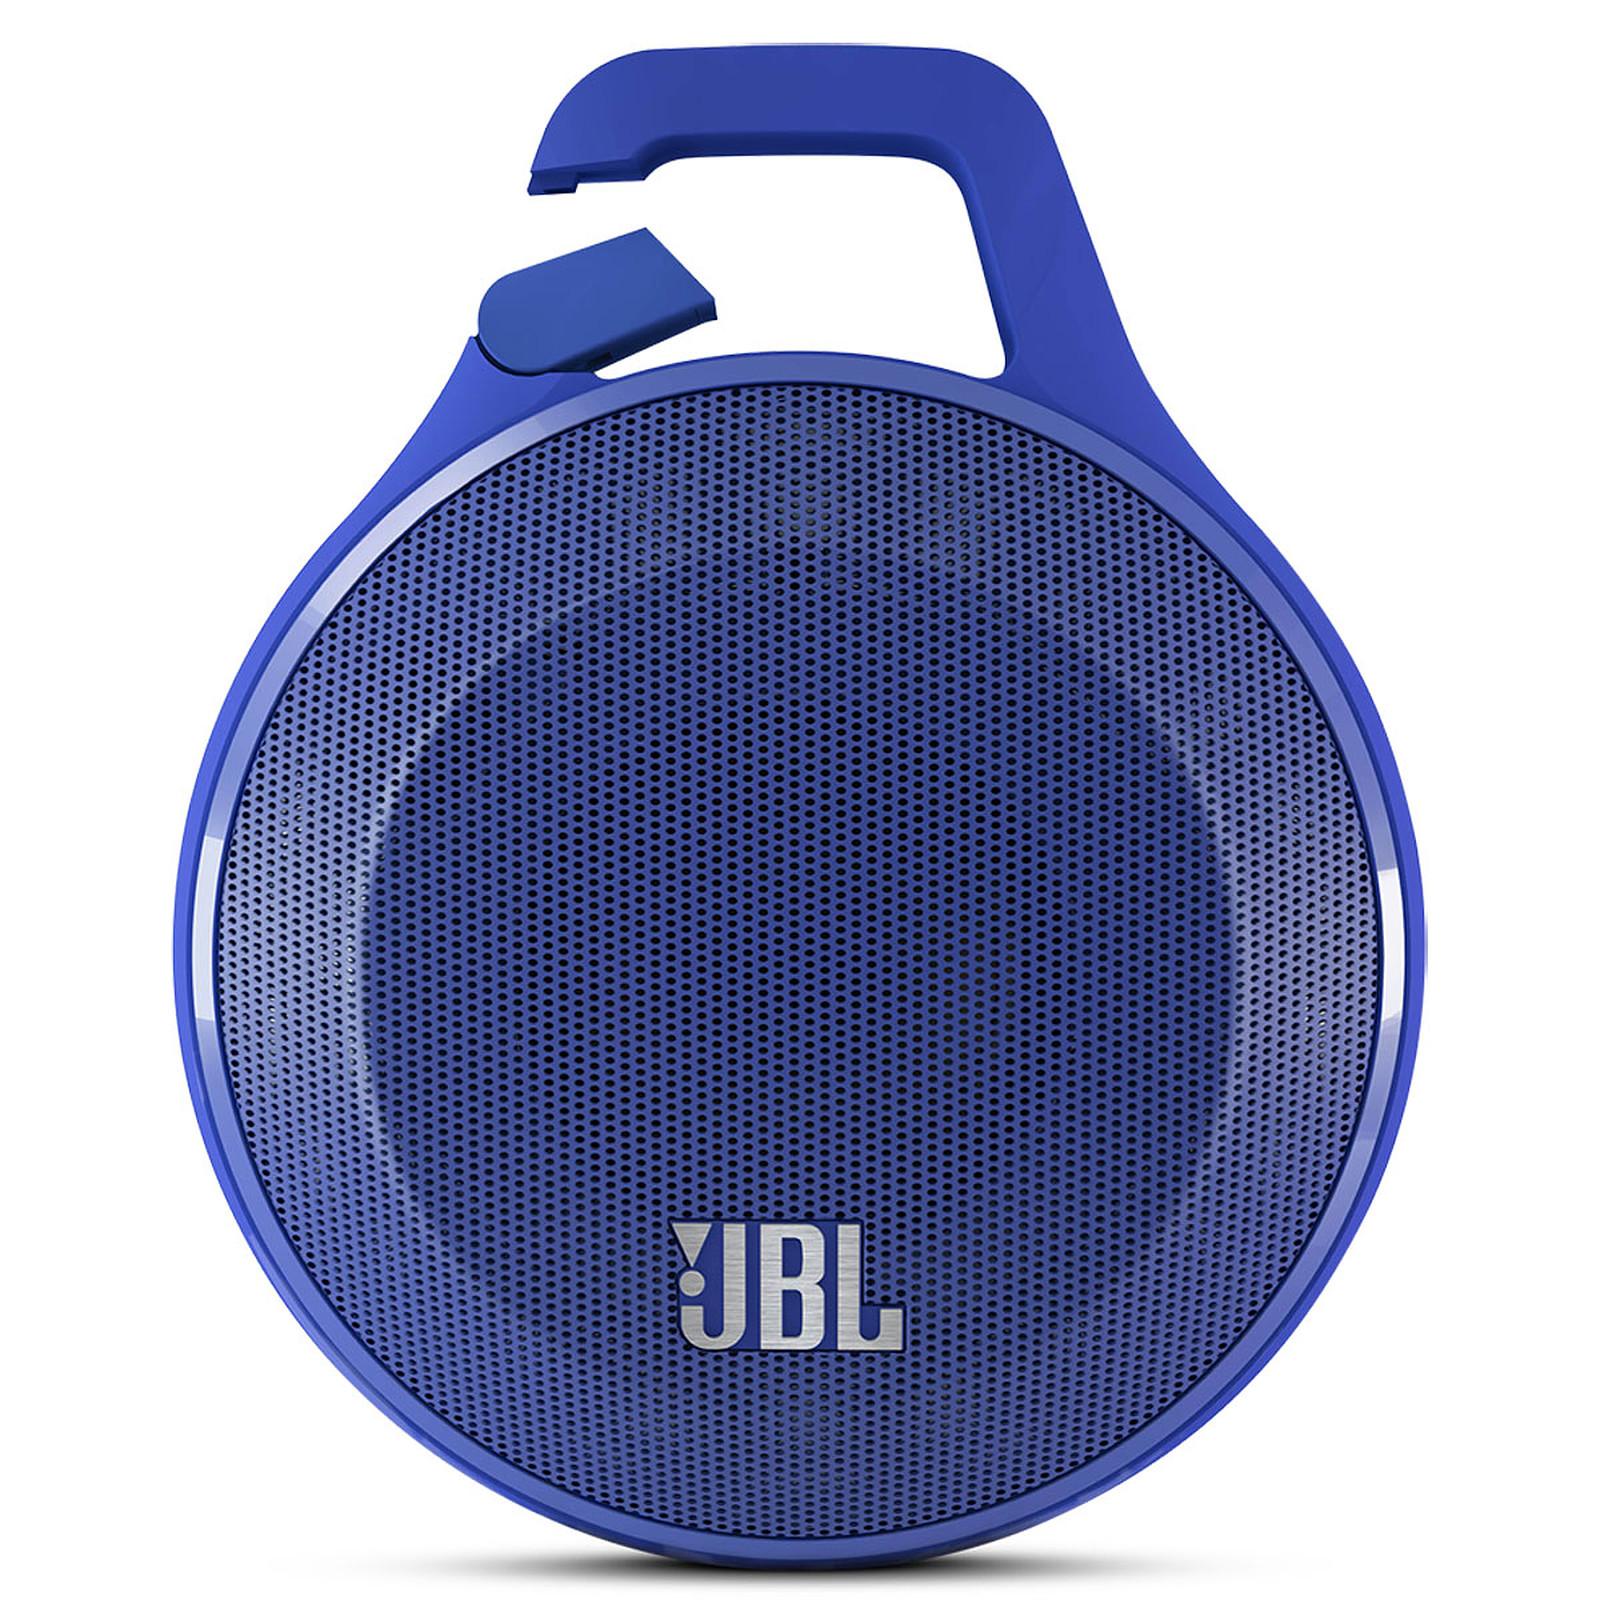 jbl clip bleu dock enceinte bluetooth jbl sur. Black Bedroom Furniture Sets. Home Design Ideas